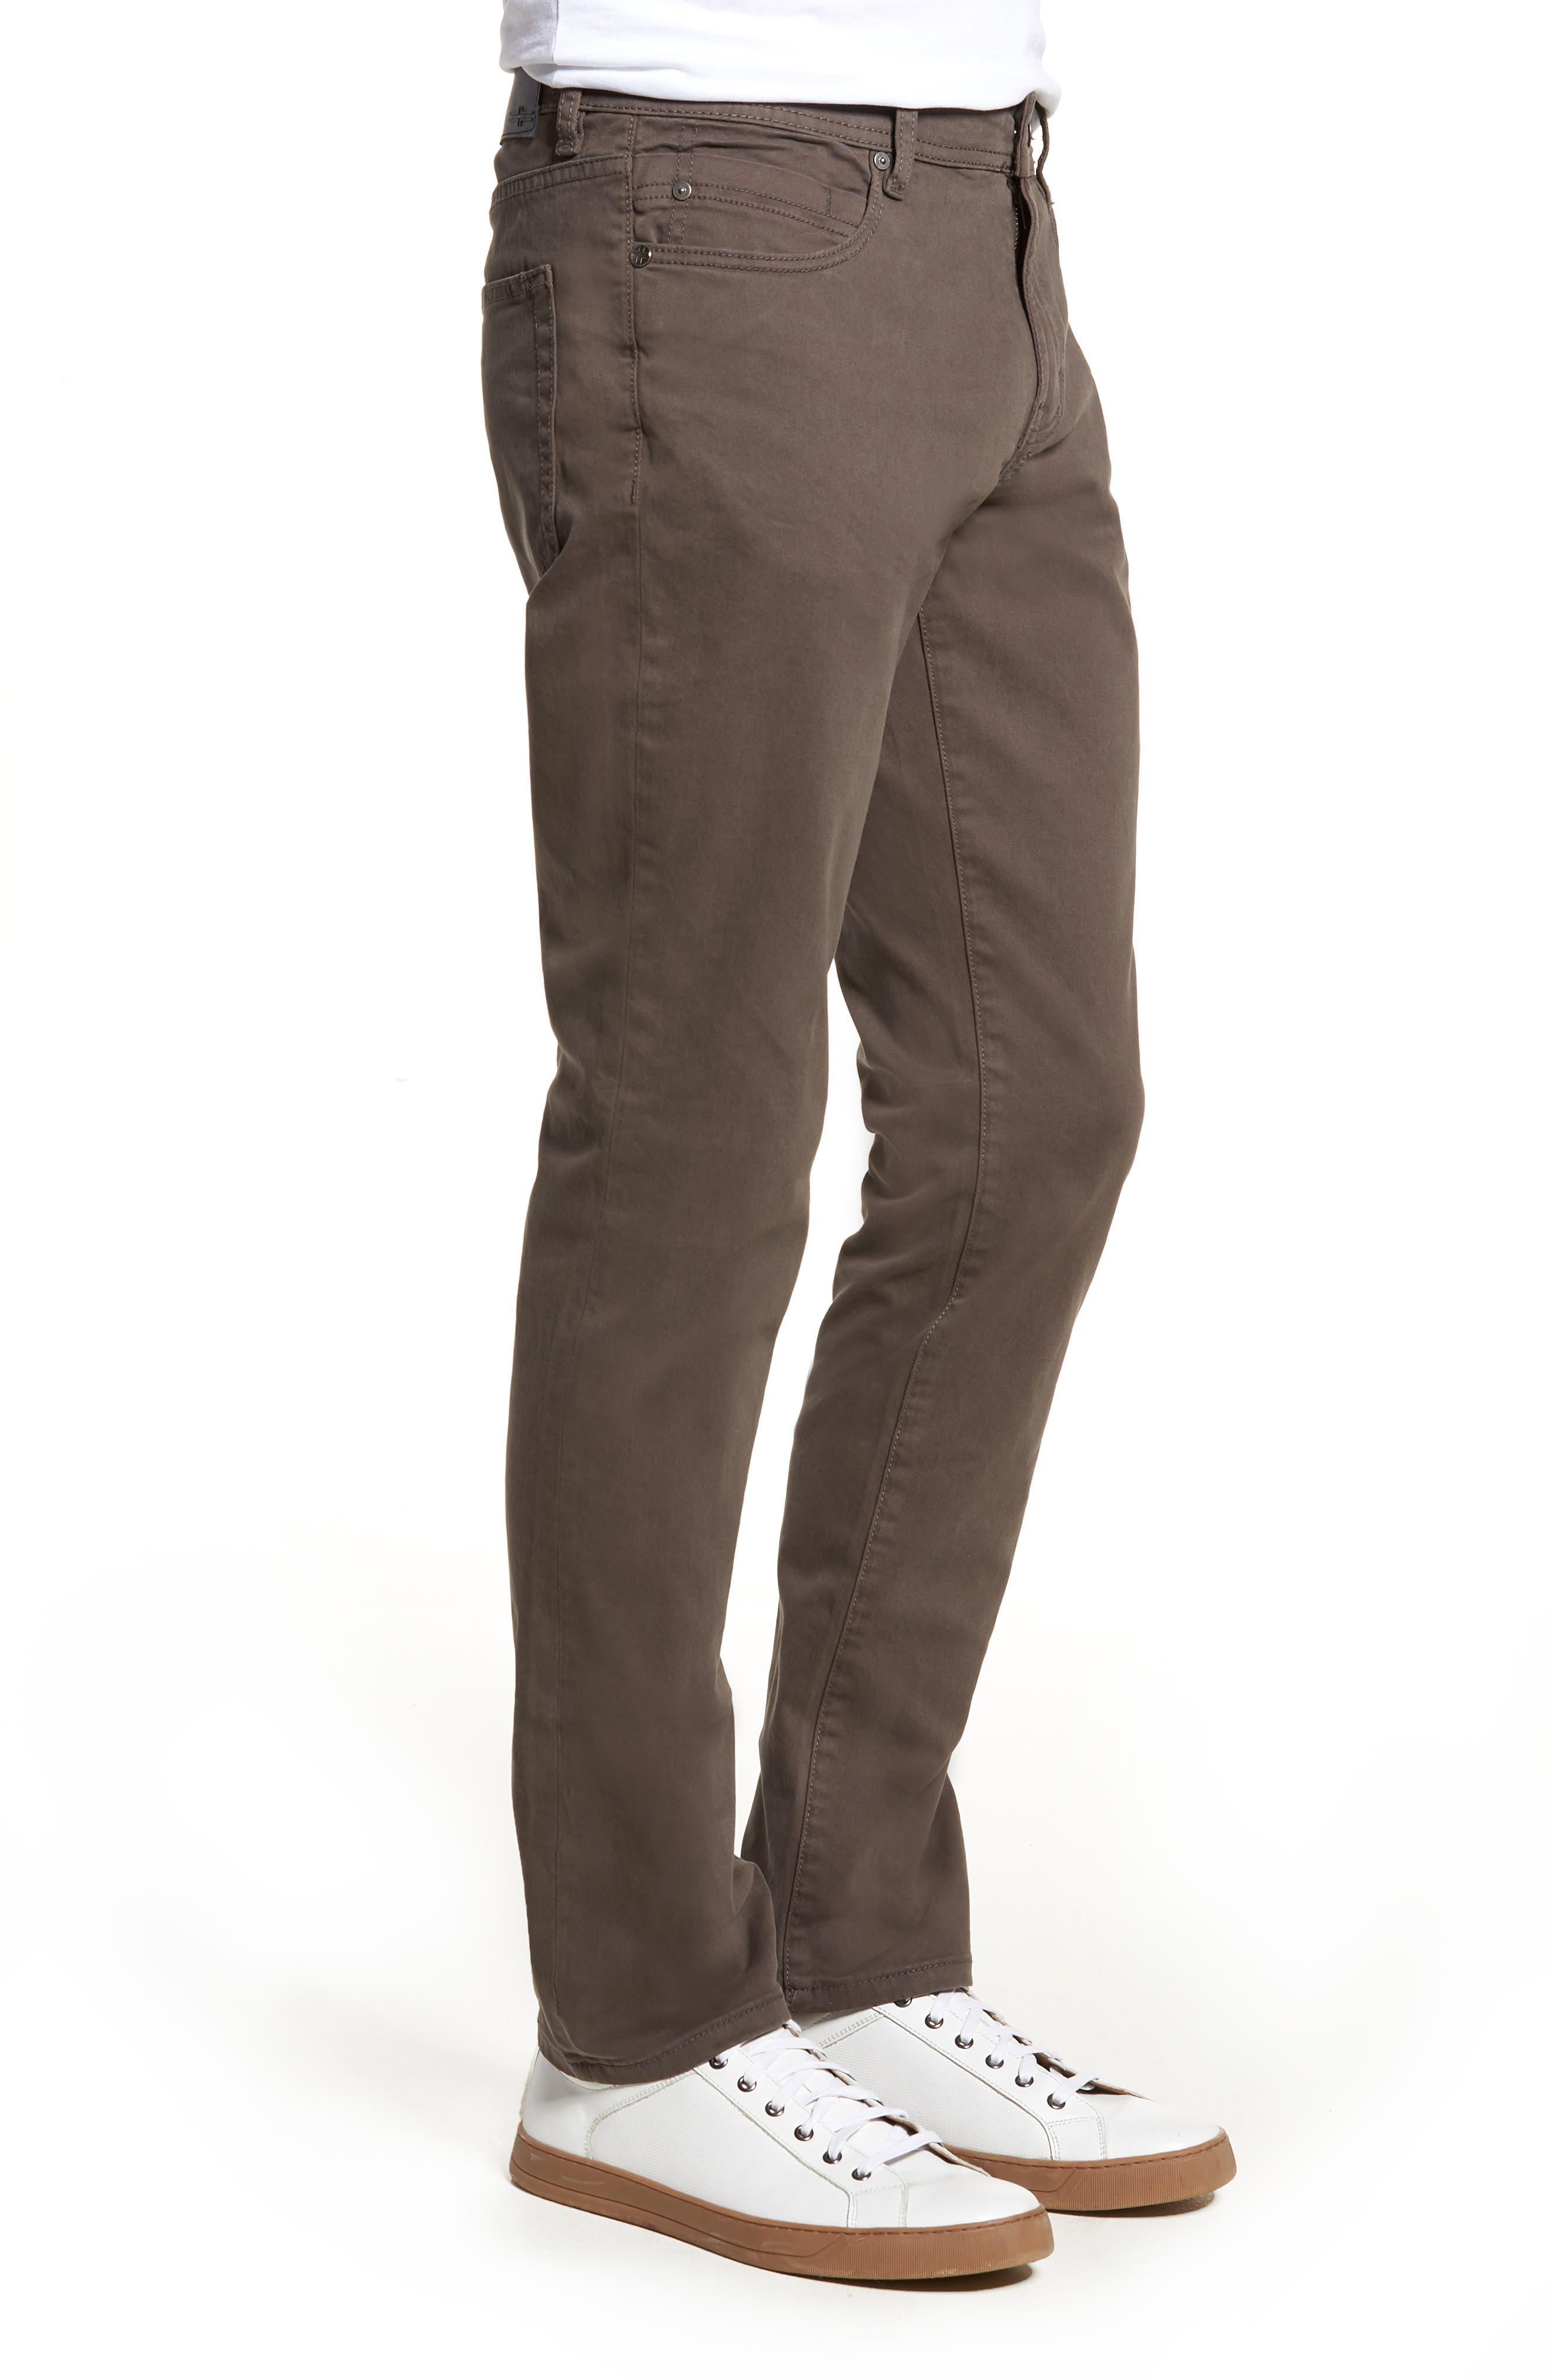 Jeans Co. Kingston Slim Straight Leg Jeans,                             Alternate thumbnail 3, color,                             Deep Earth